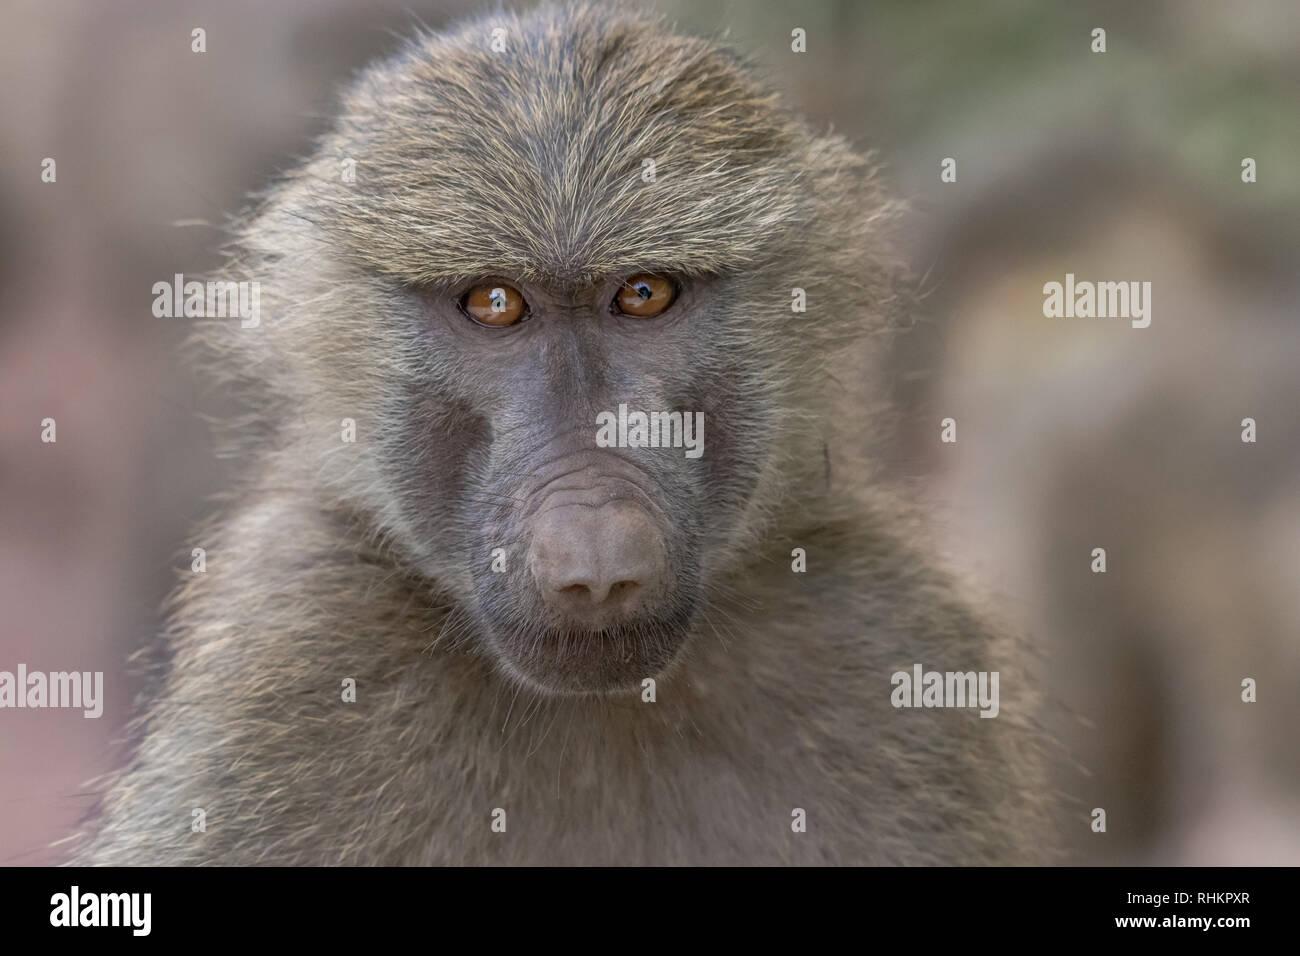 Baboon face portrait - Stock Image